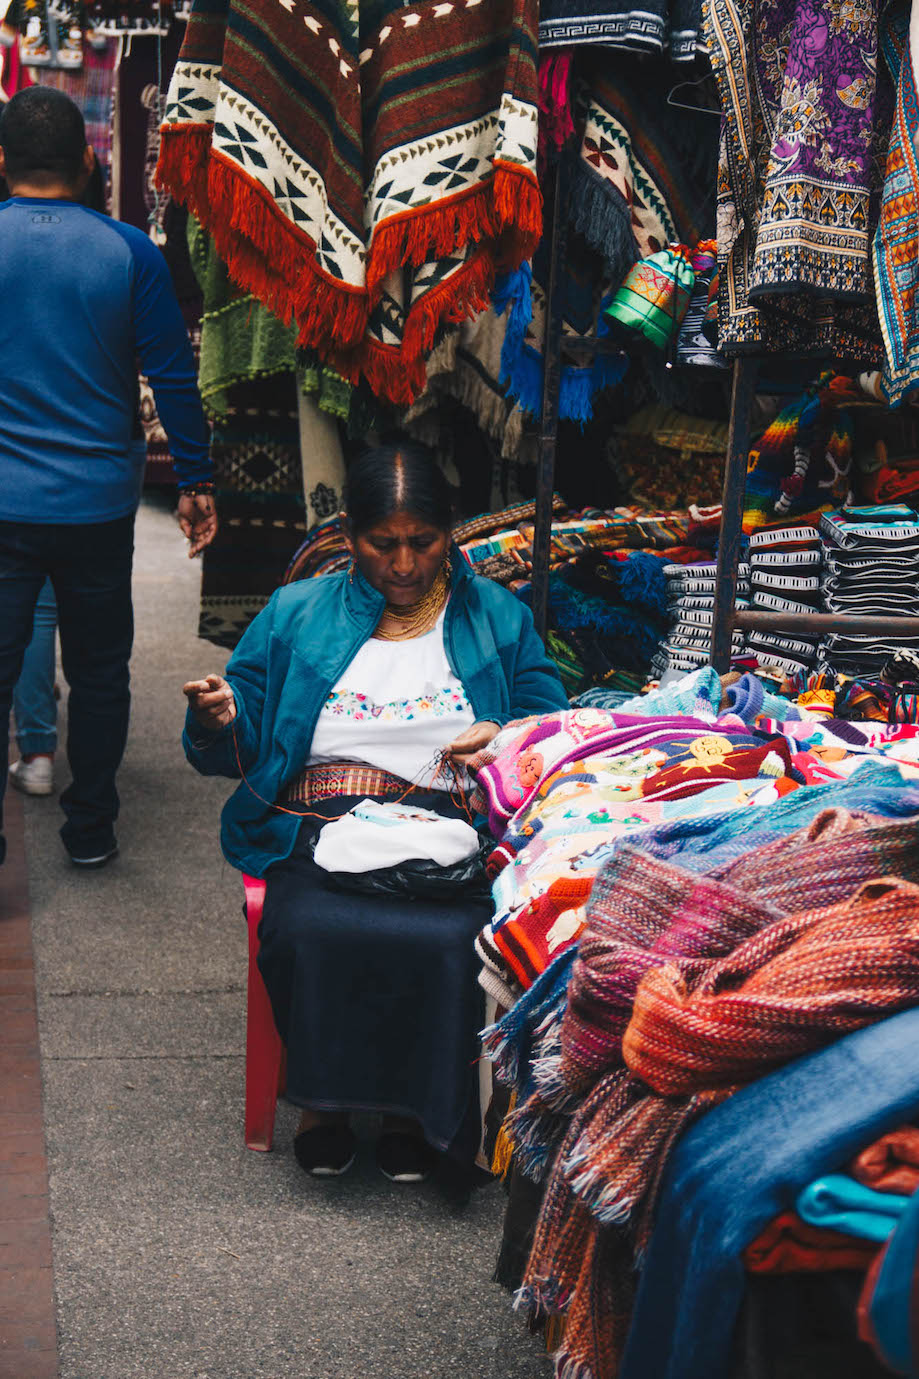 Mercado de artesanato de Otavalo